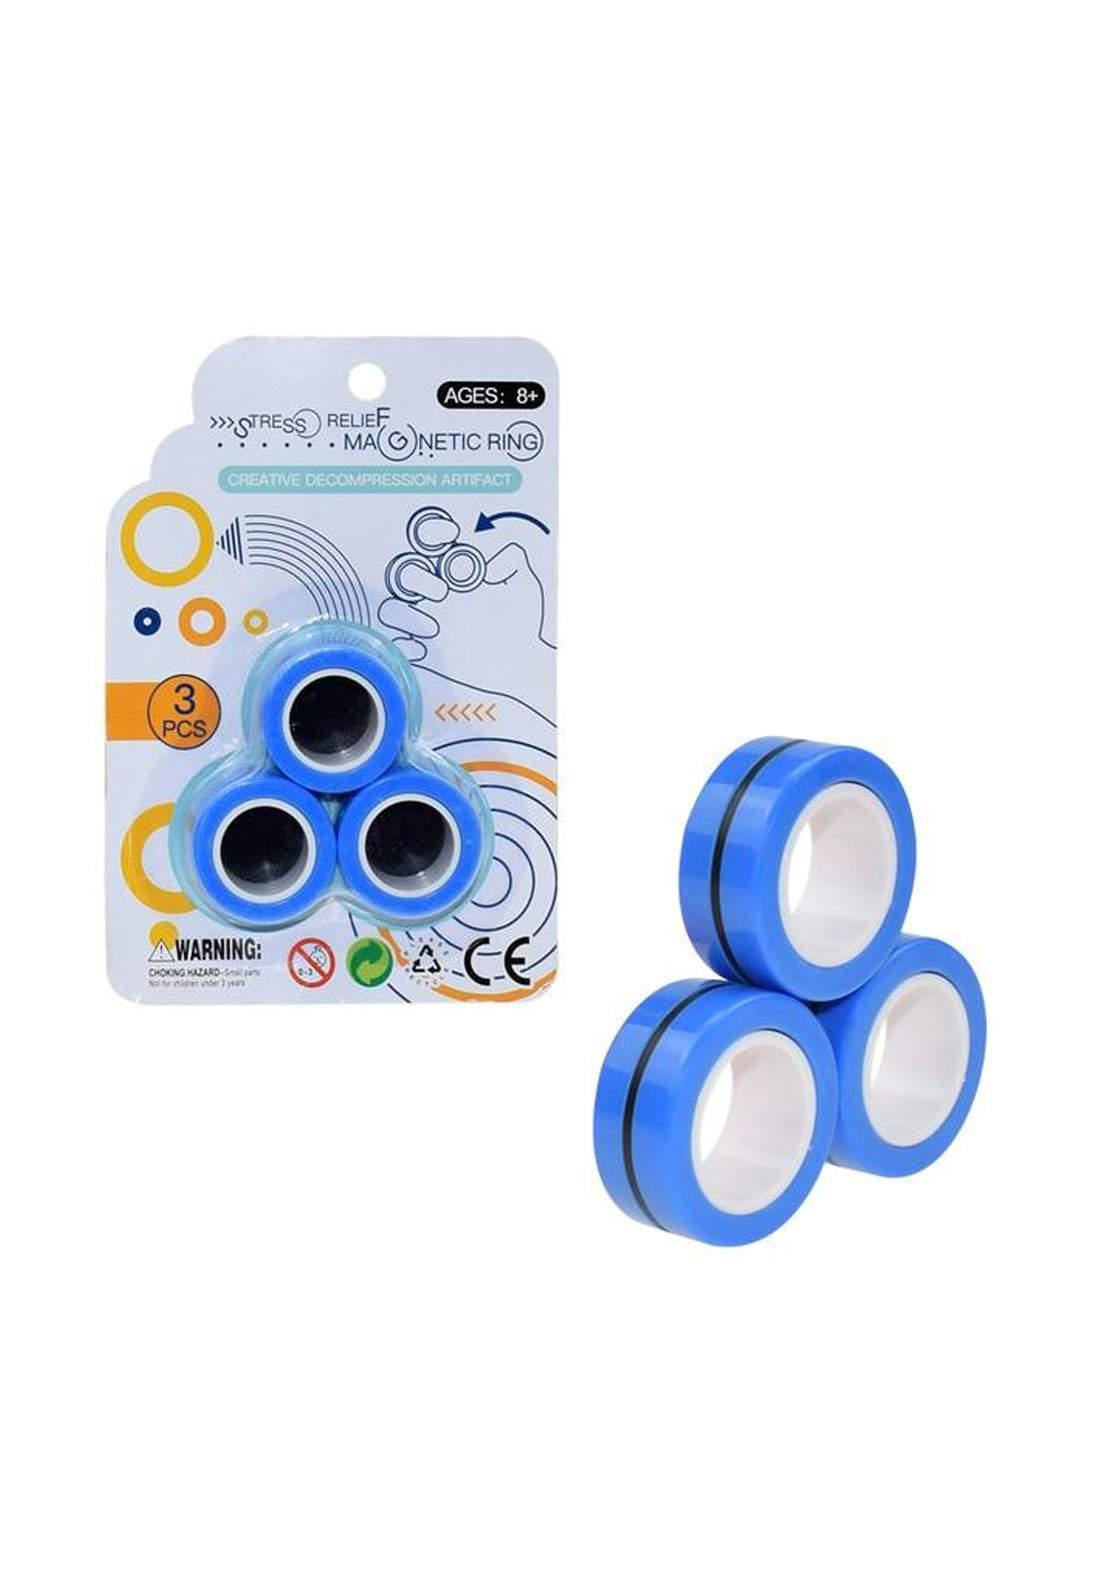 Stress Relief Magnetic Ring Toys 3Pcs  لعبة حلقة مغناطيسية لتخفيف التوتر